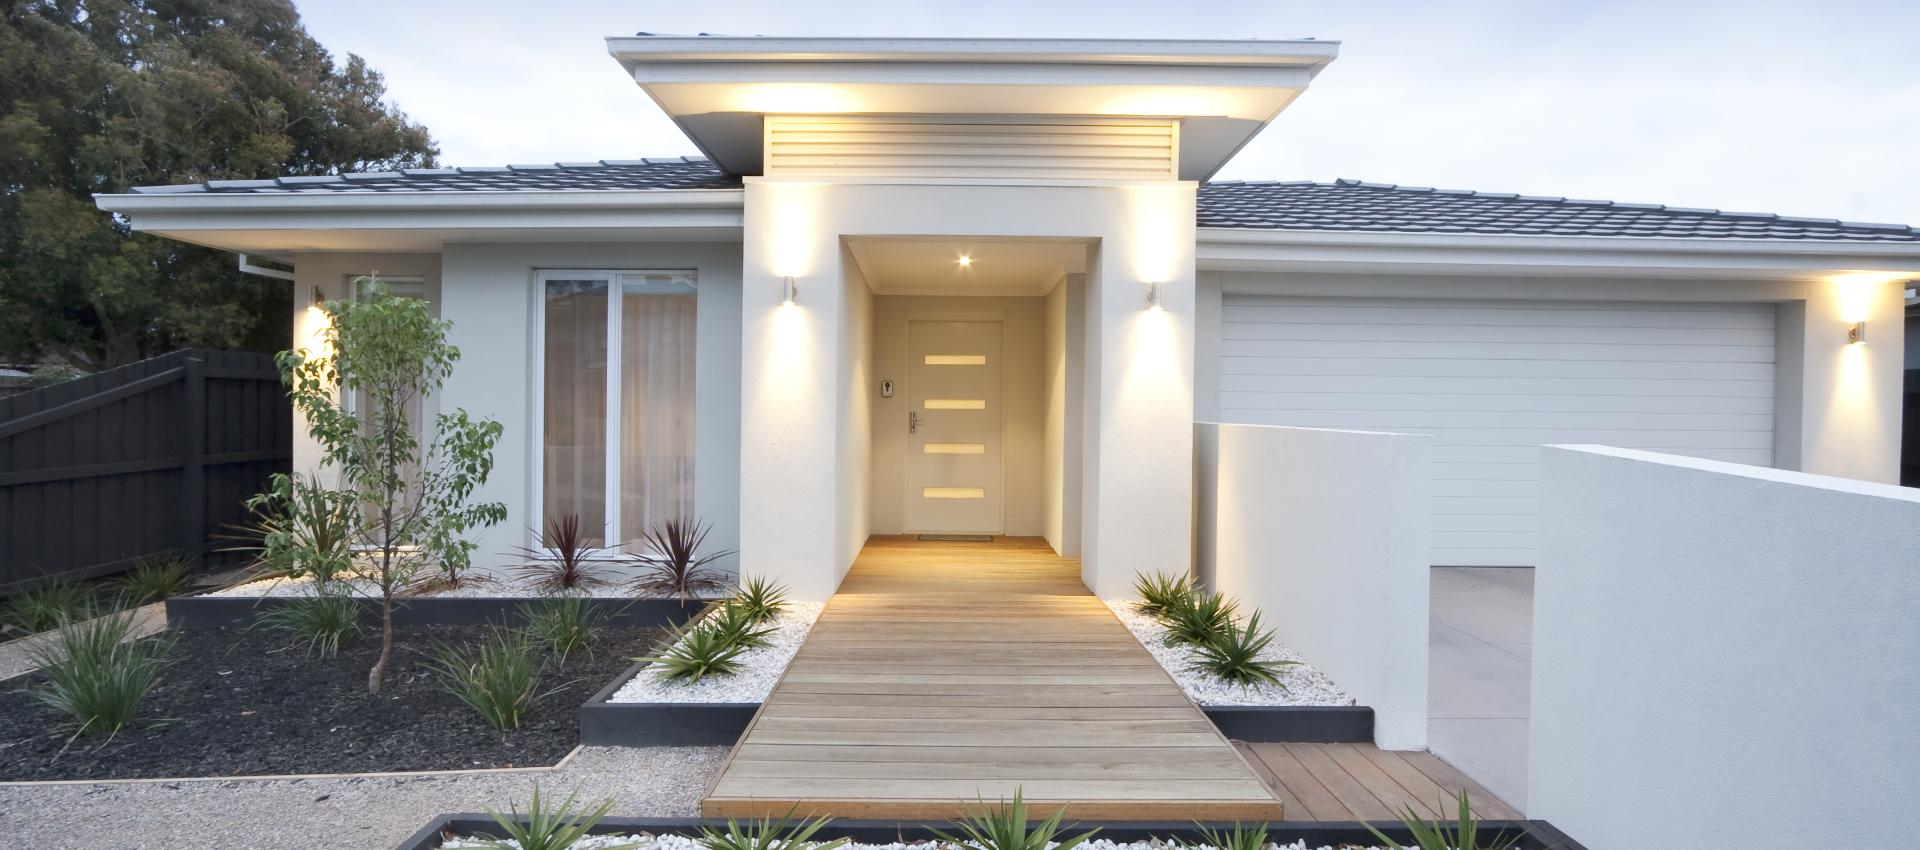 White modern bungalow